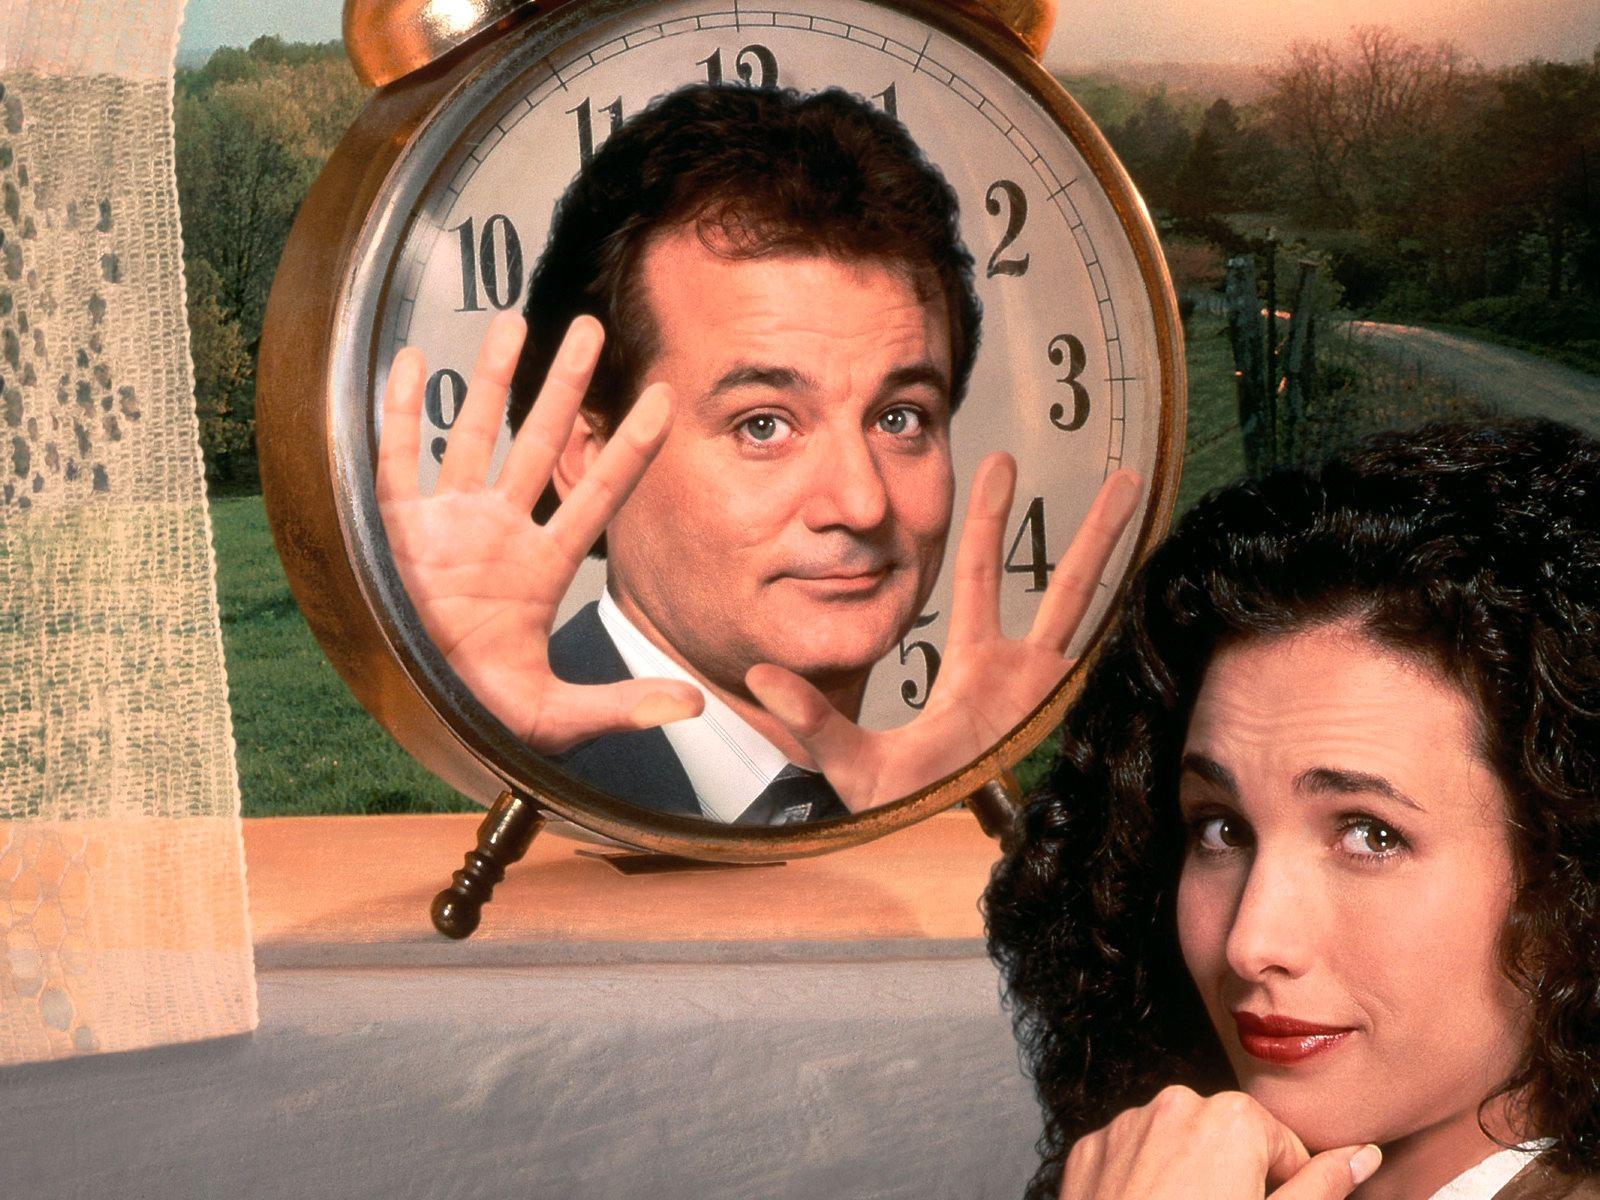 Wallpaper Man Bill Murray Groundhog Day Movies 1600x1200